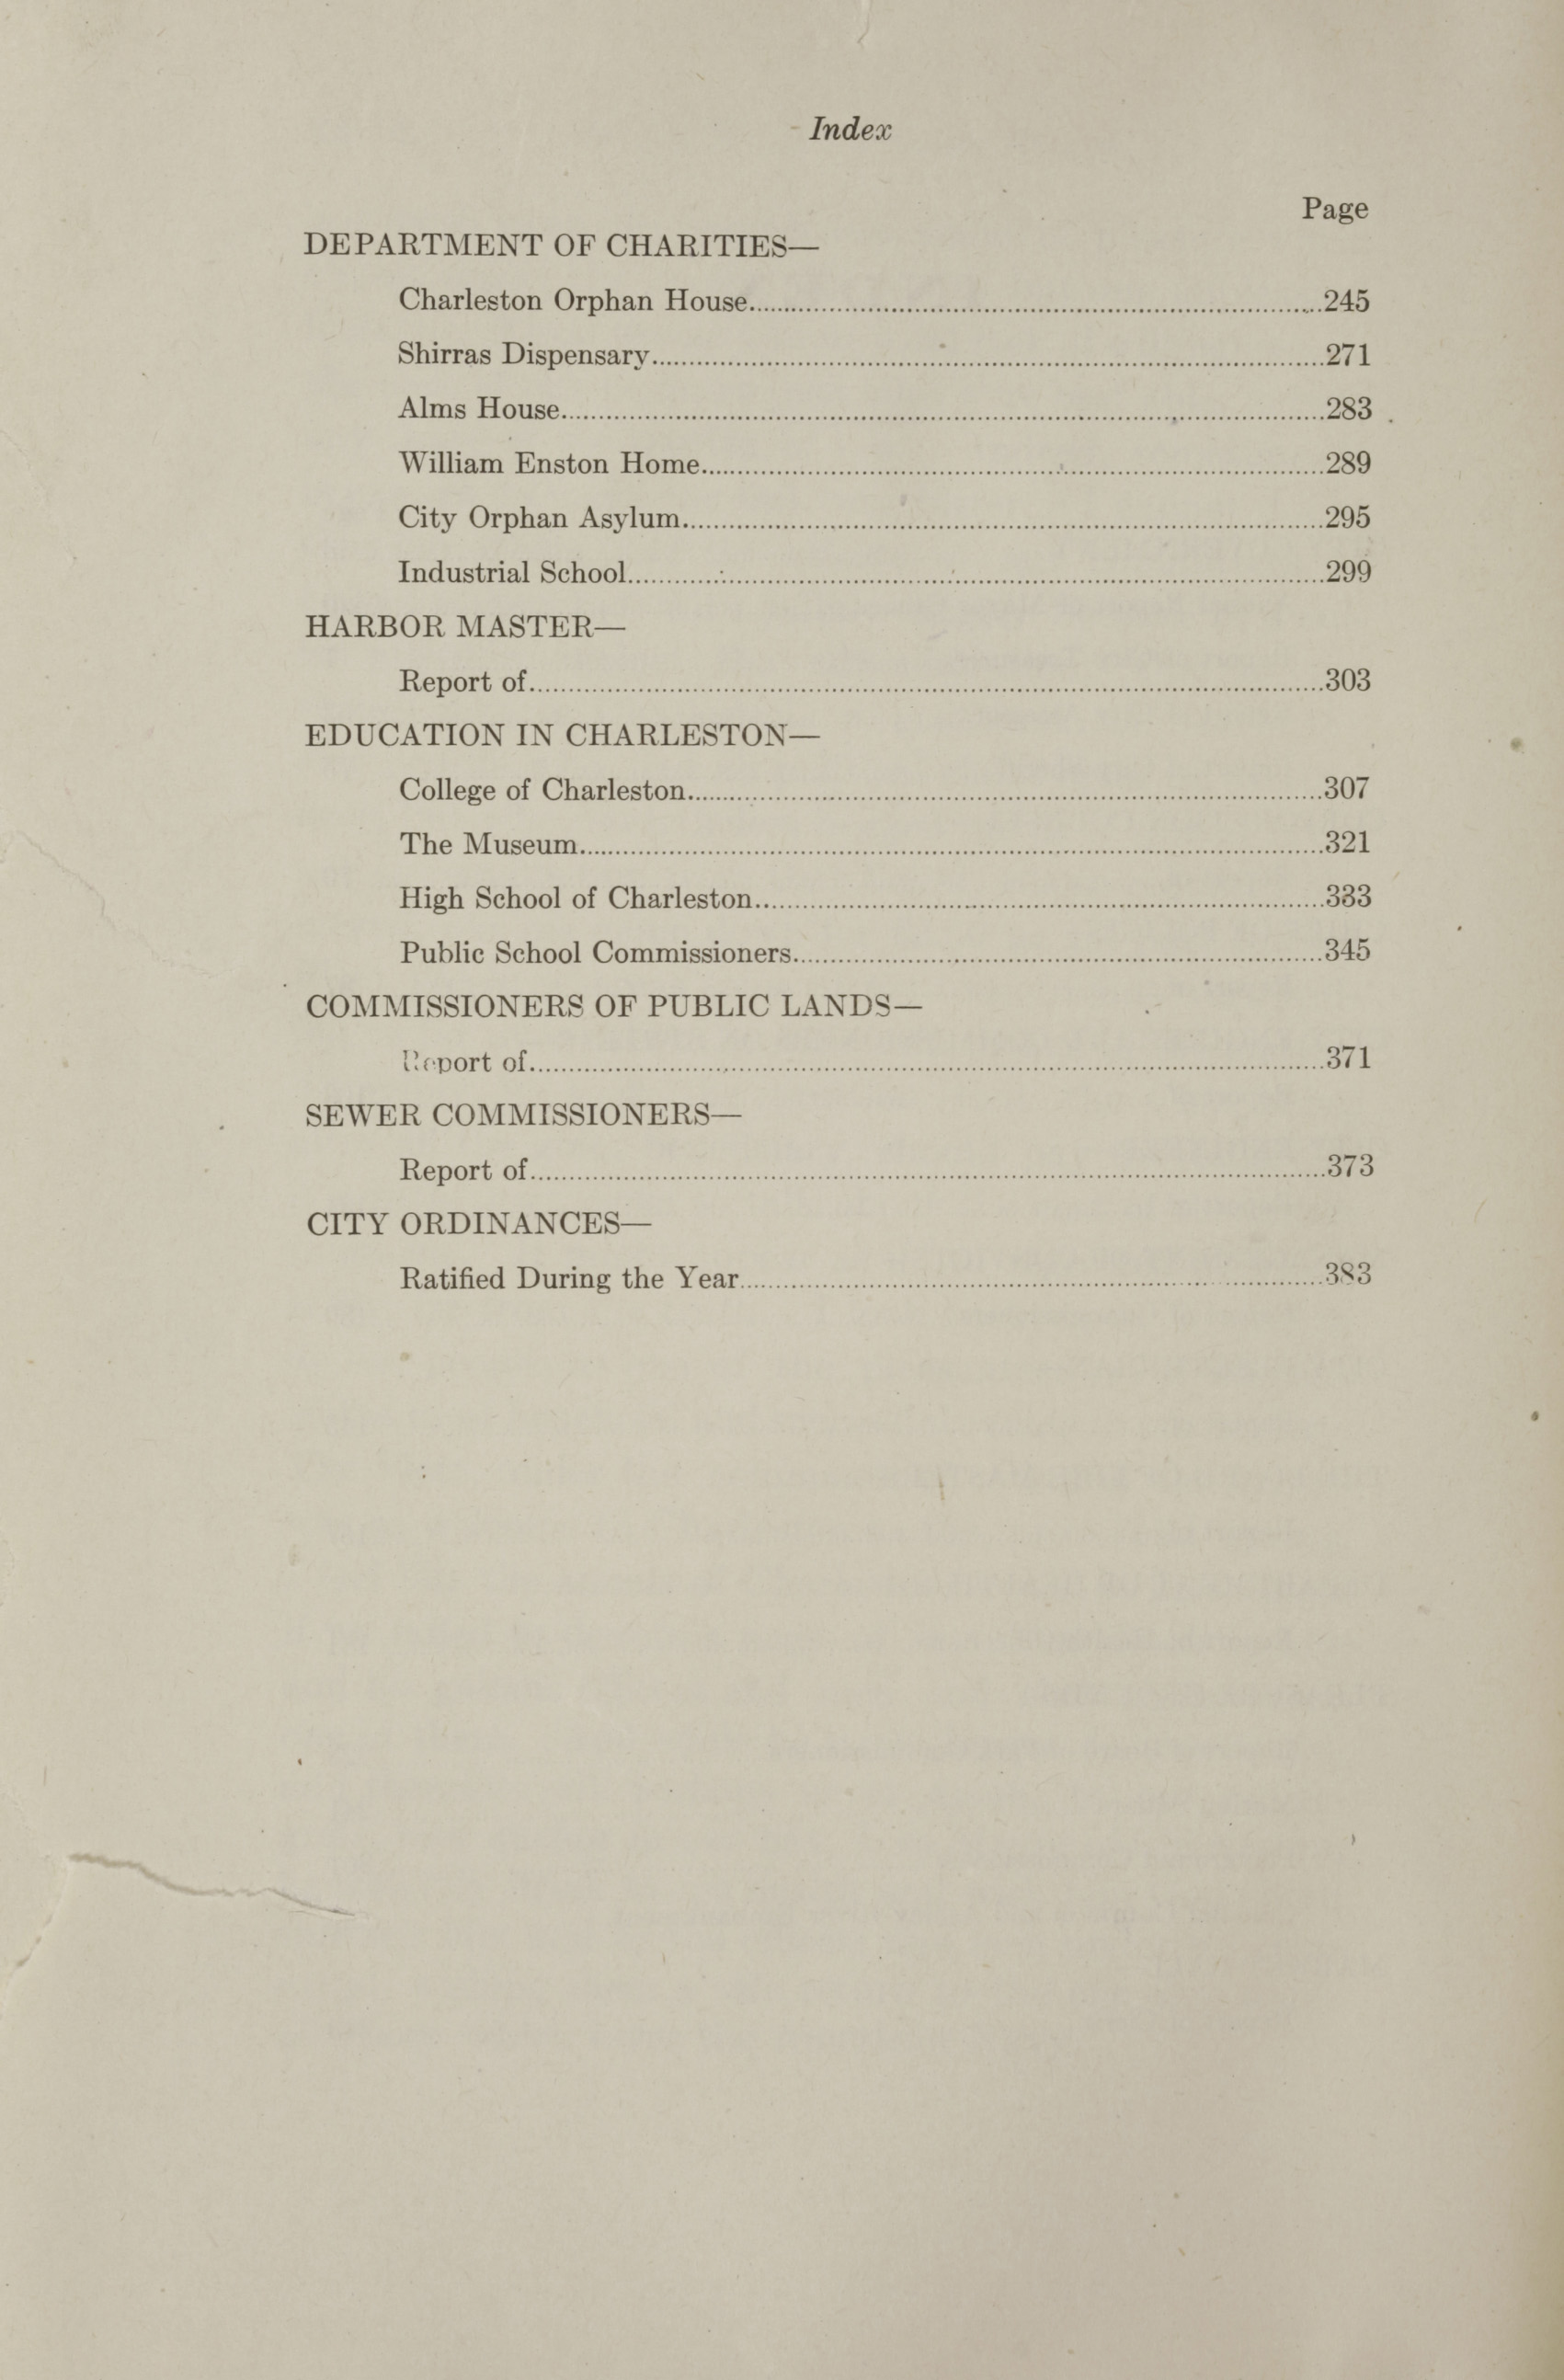 Charleston Yearbook, 1912, Index